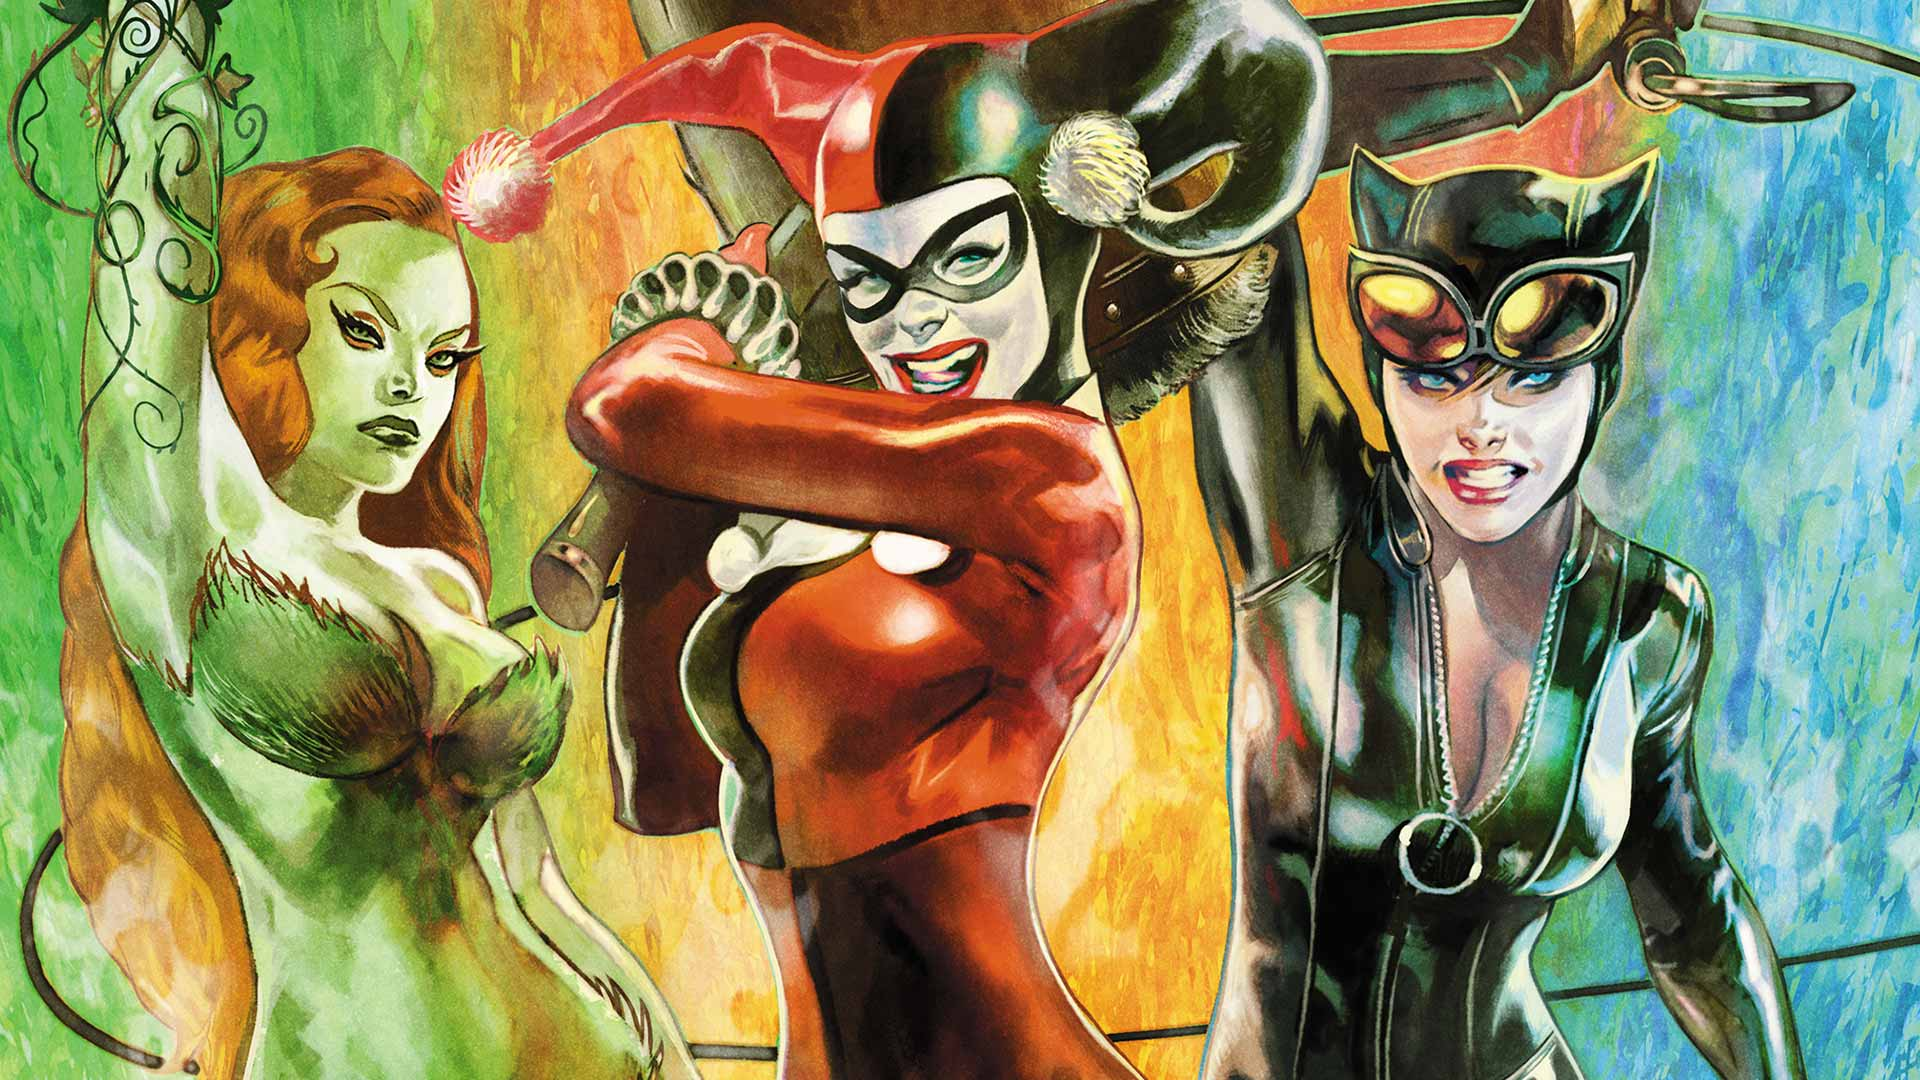 Le sirene di Gotham